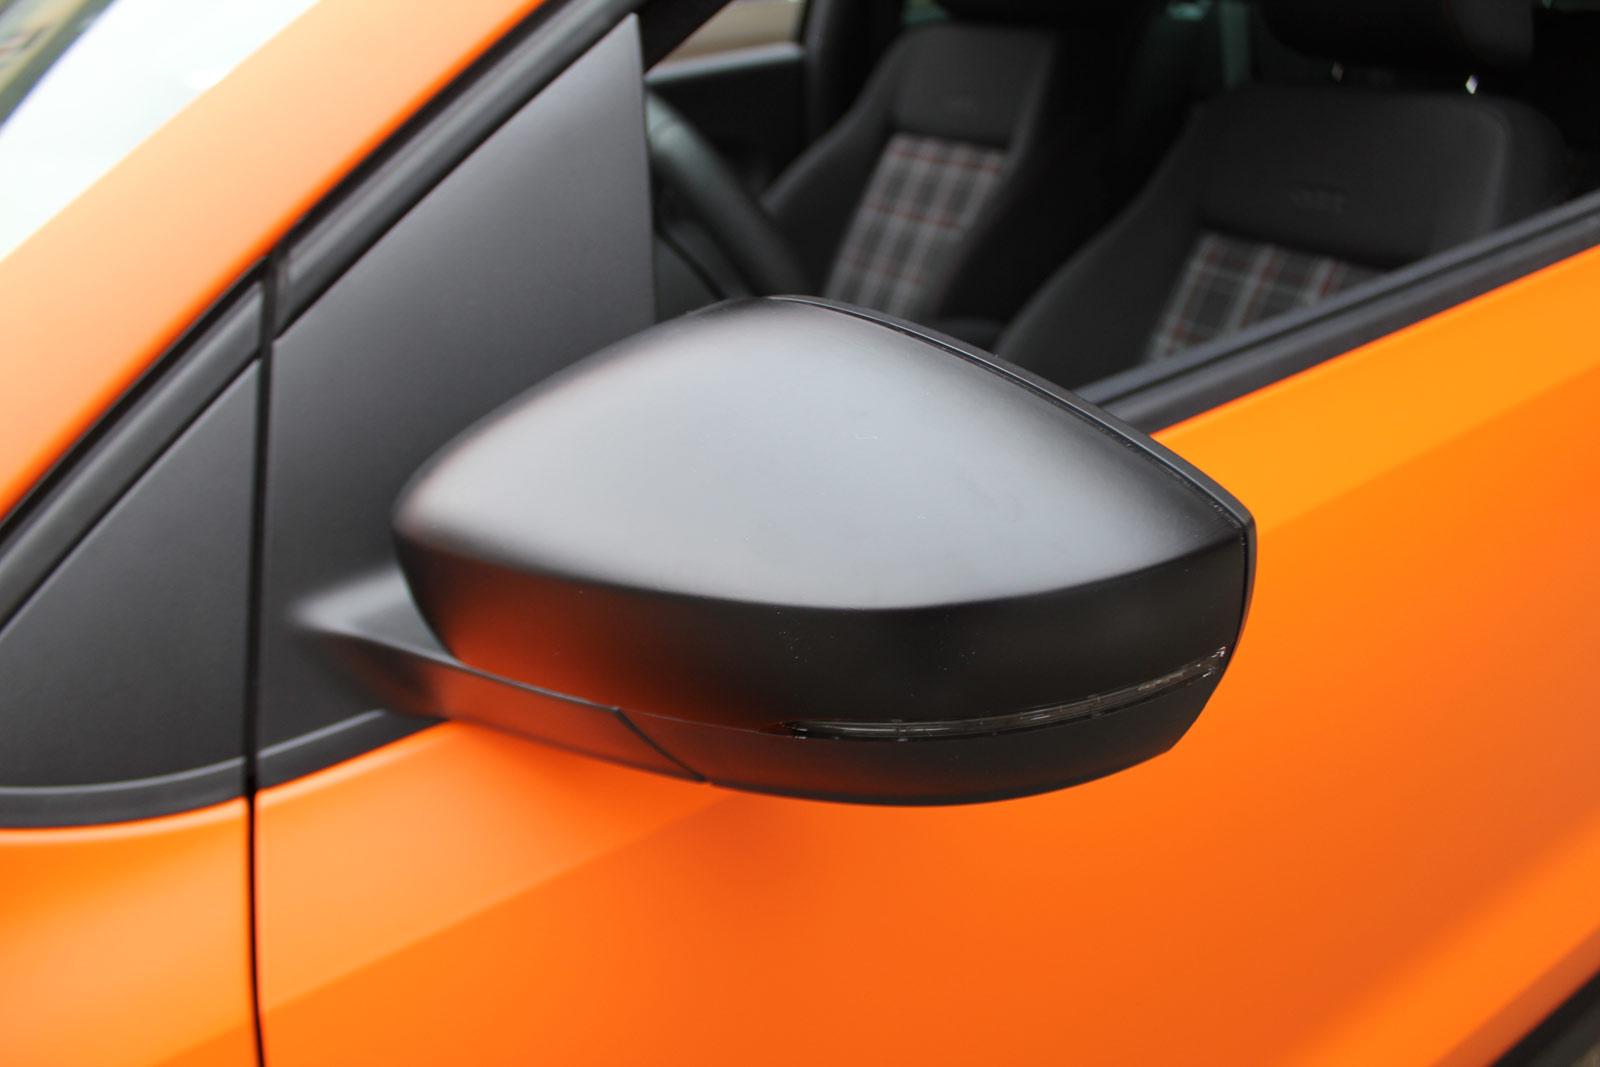 VW_Polo_GTI_Folierung_Orange_Matt_16